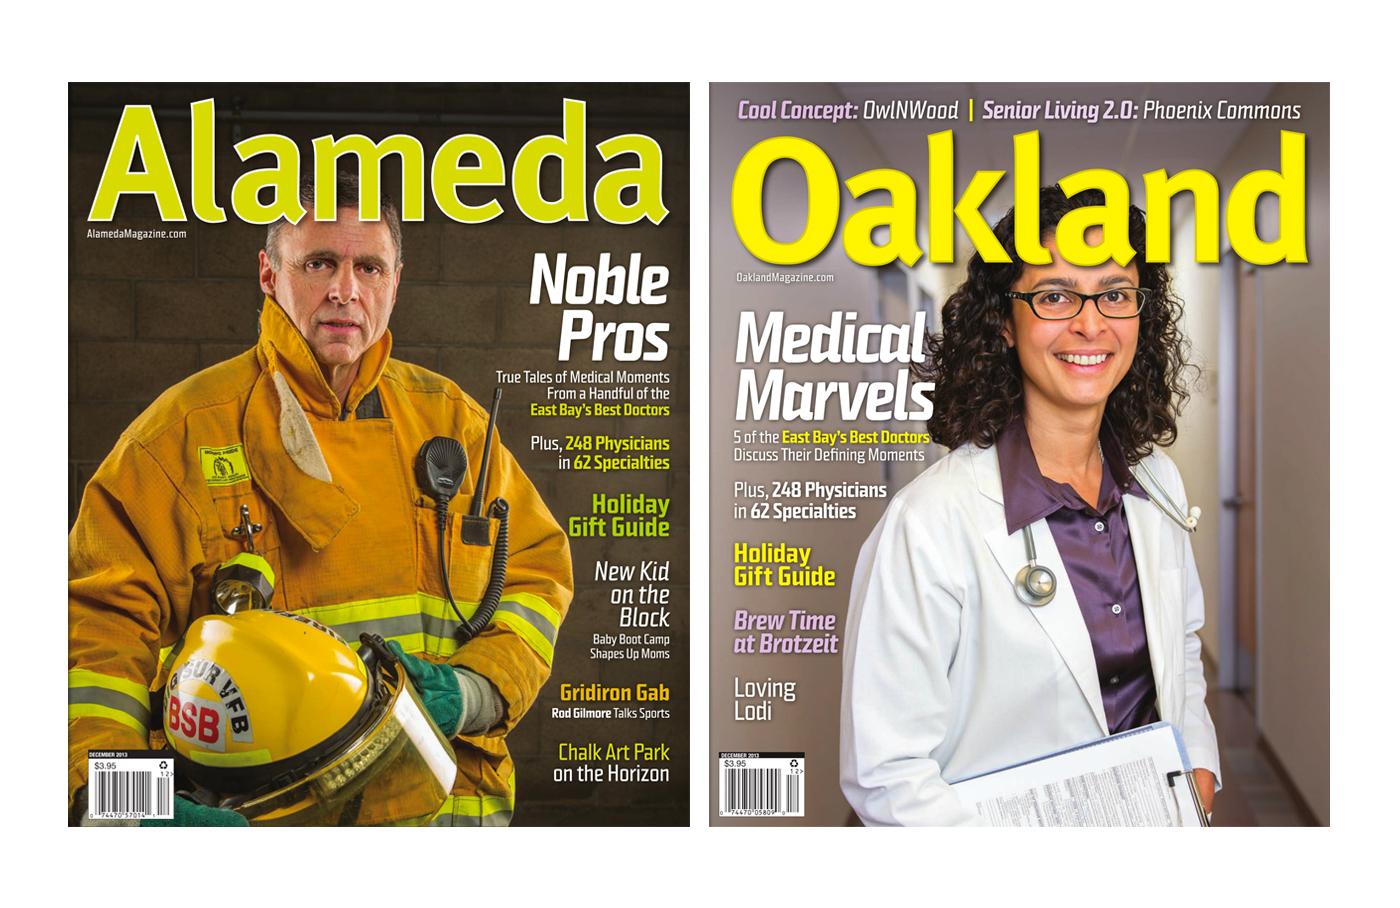 Alameda_&_Oakland_Covers.jpg